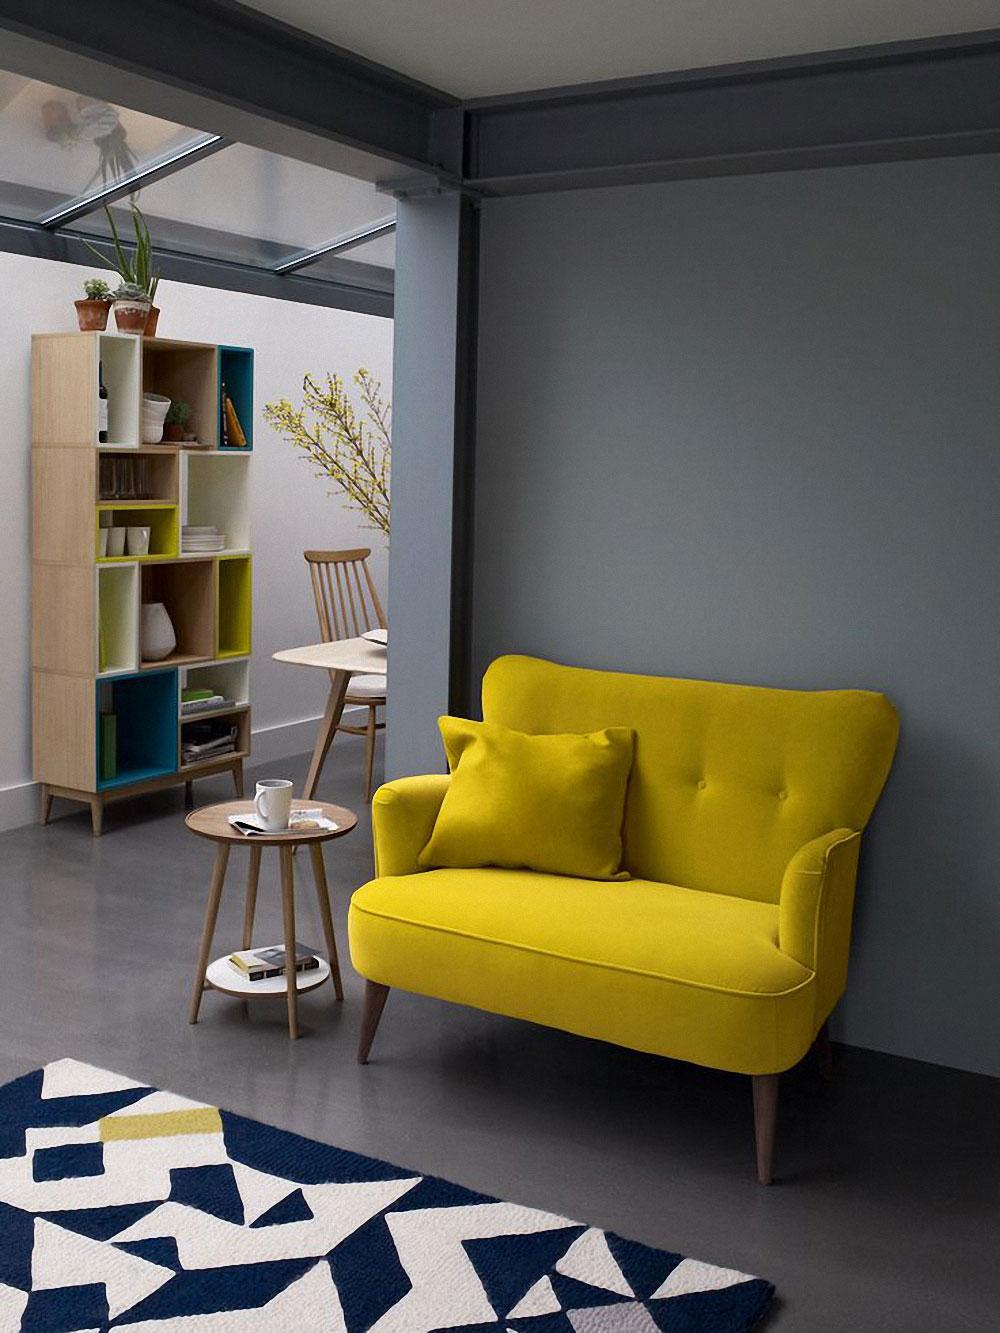 jestcafe.com--grey-rooms-6